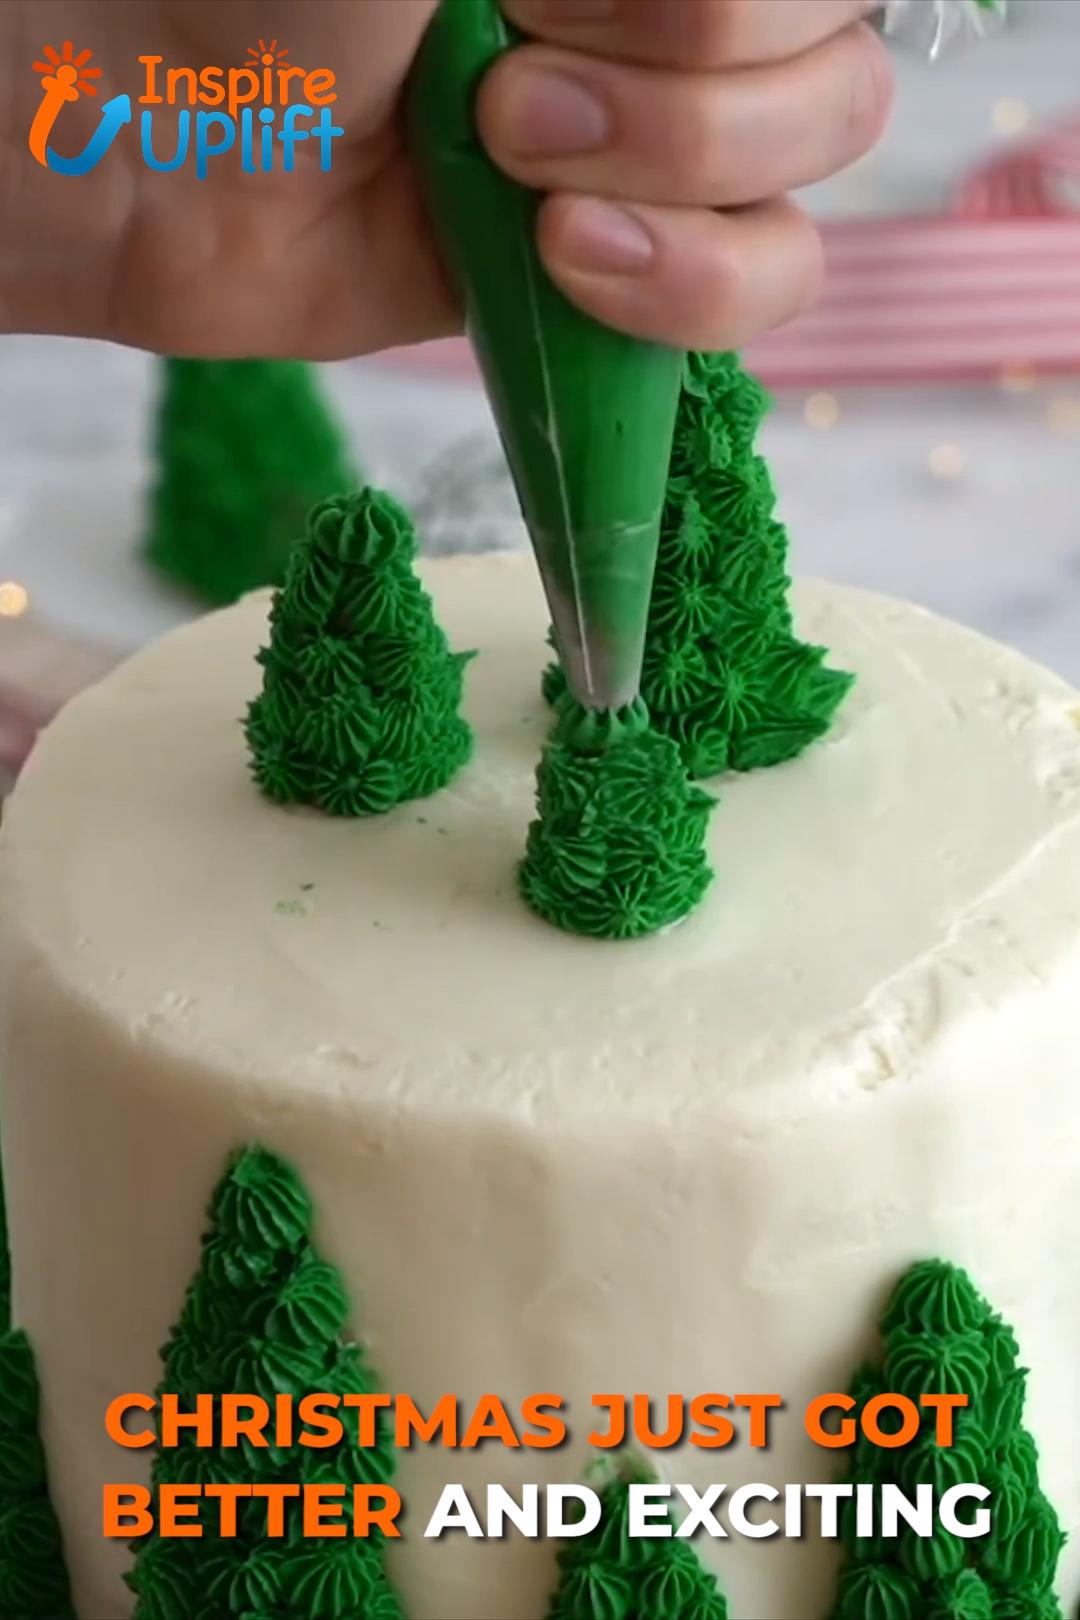 Photo of Icing Piping Tips Christmas Design 😍 InspireUplift.com